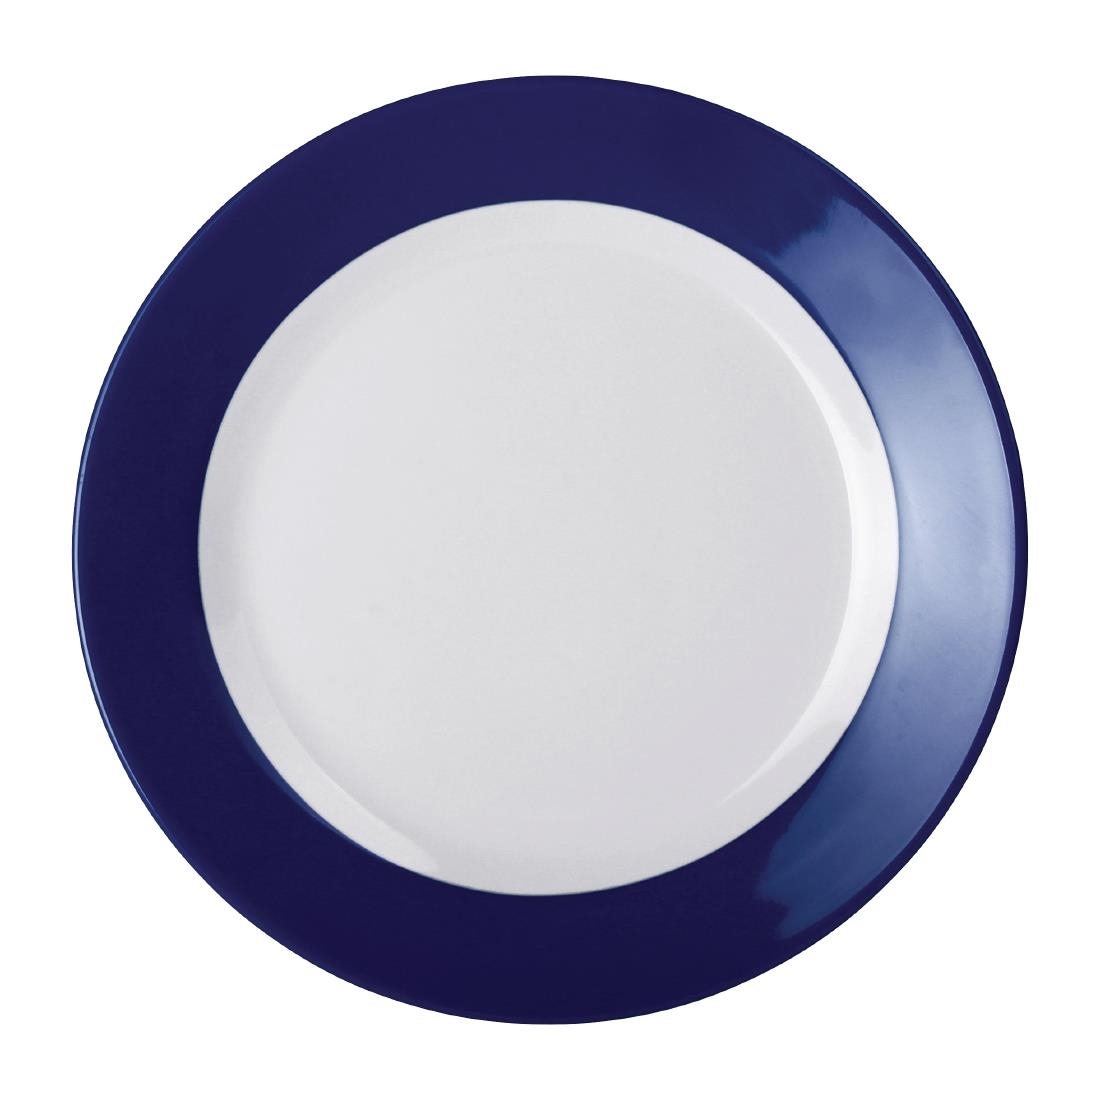 Gala Plate - Blue